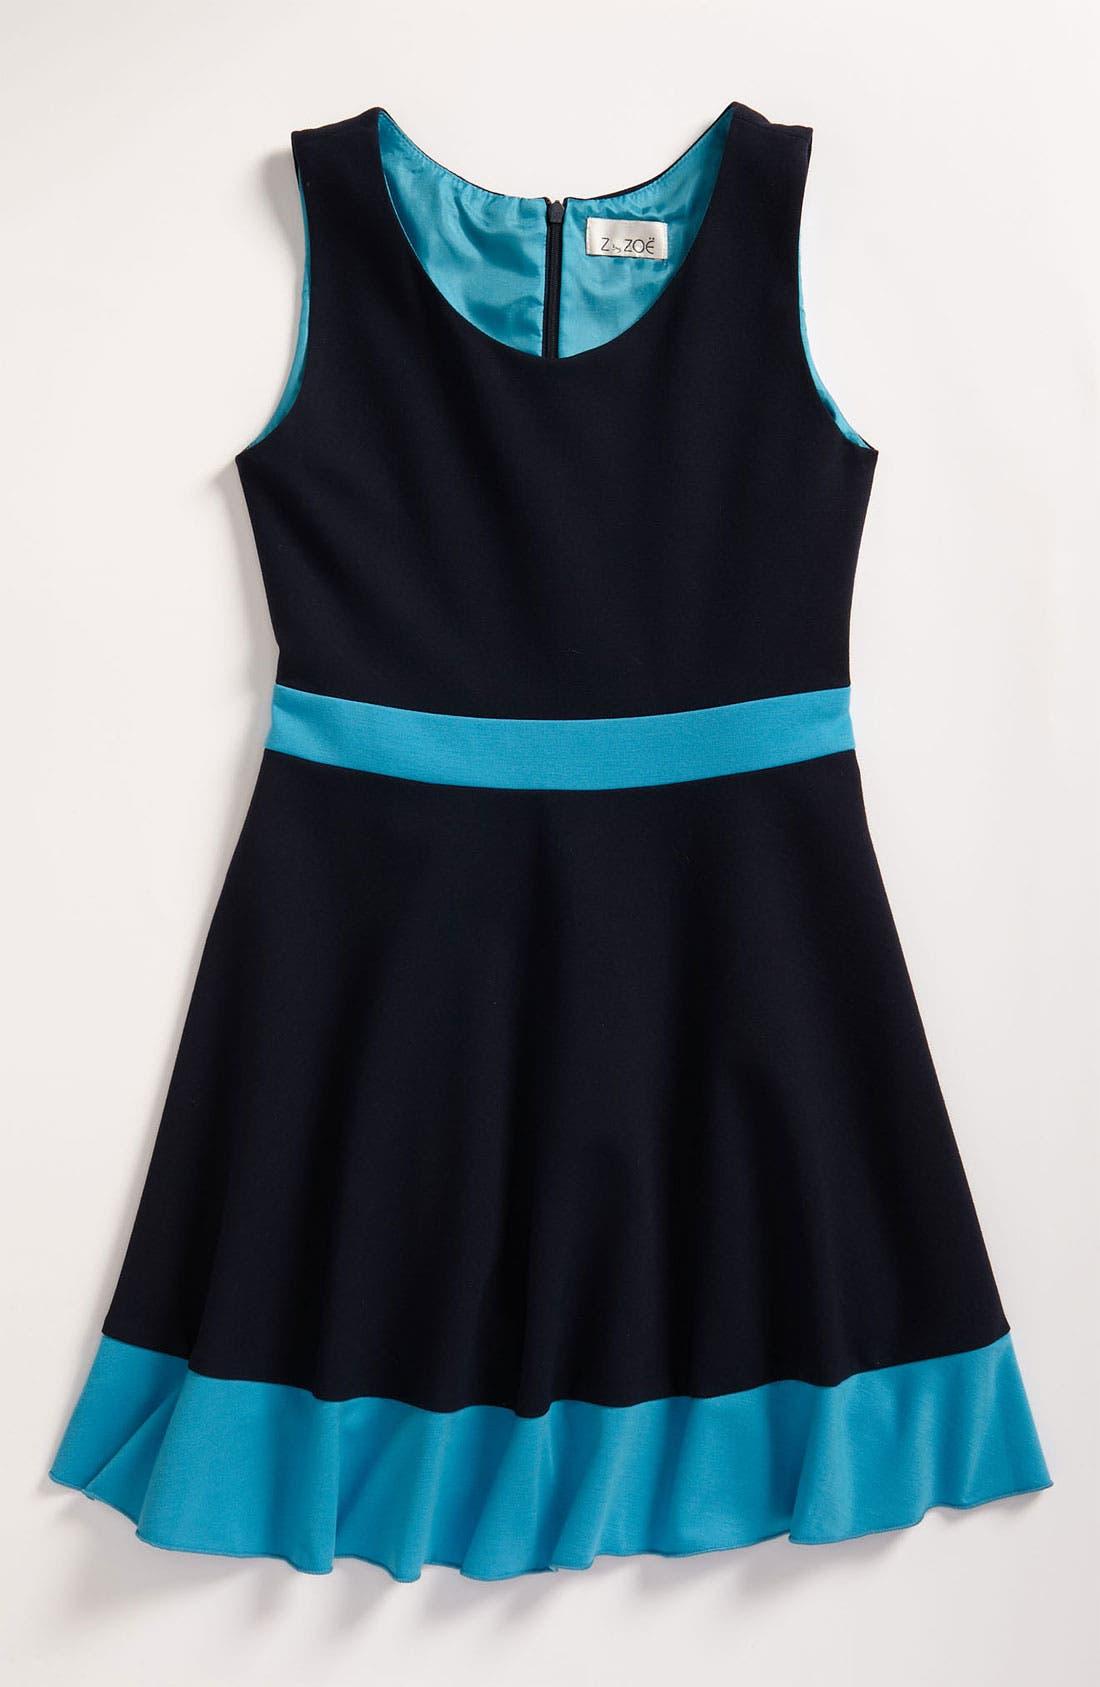 Main Image - Zoe Ltd Colorblock Tank Dress (Big Girls)